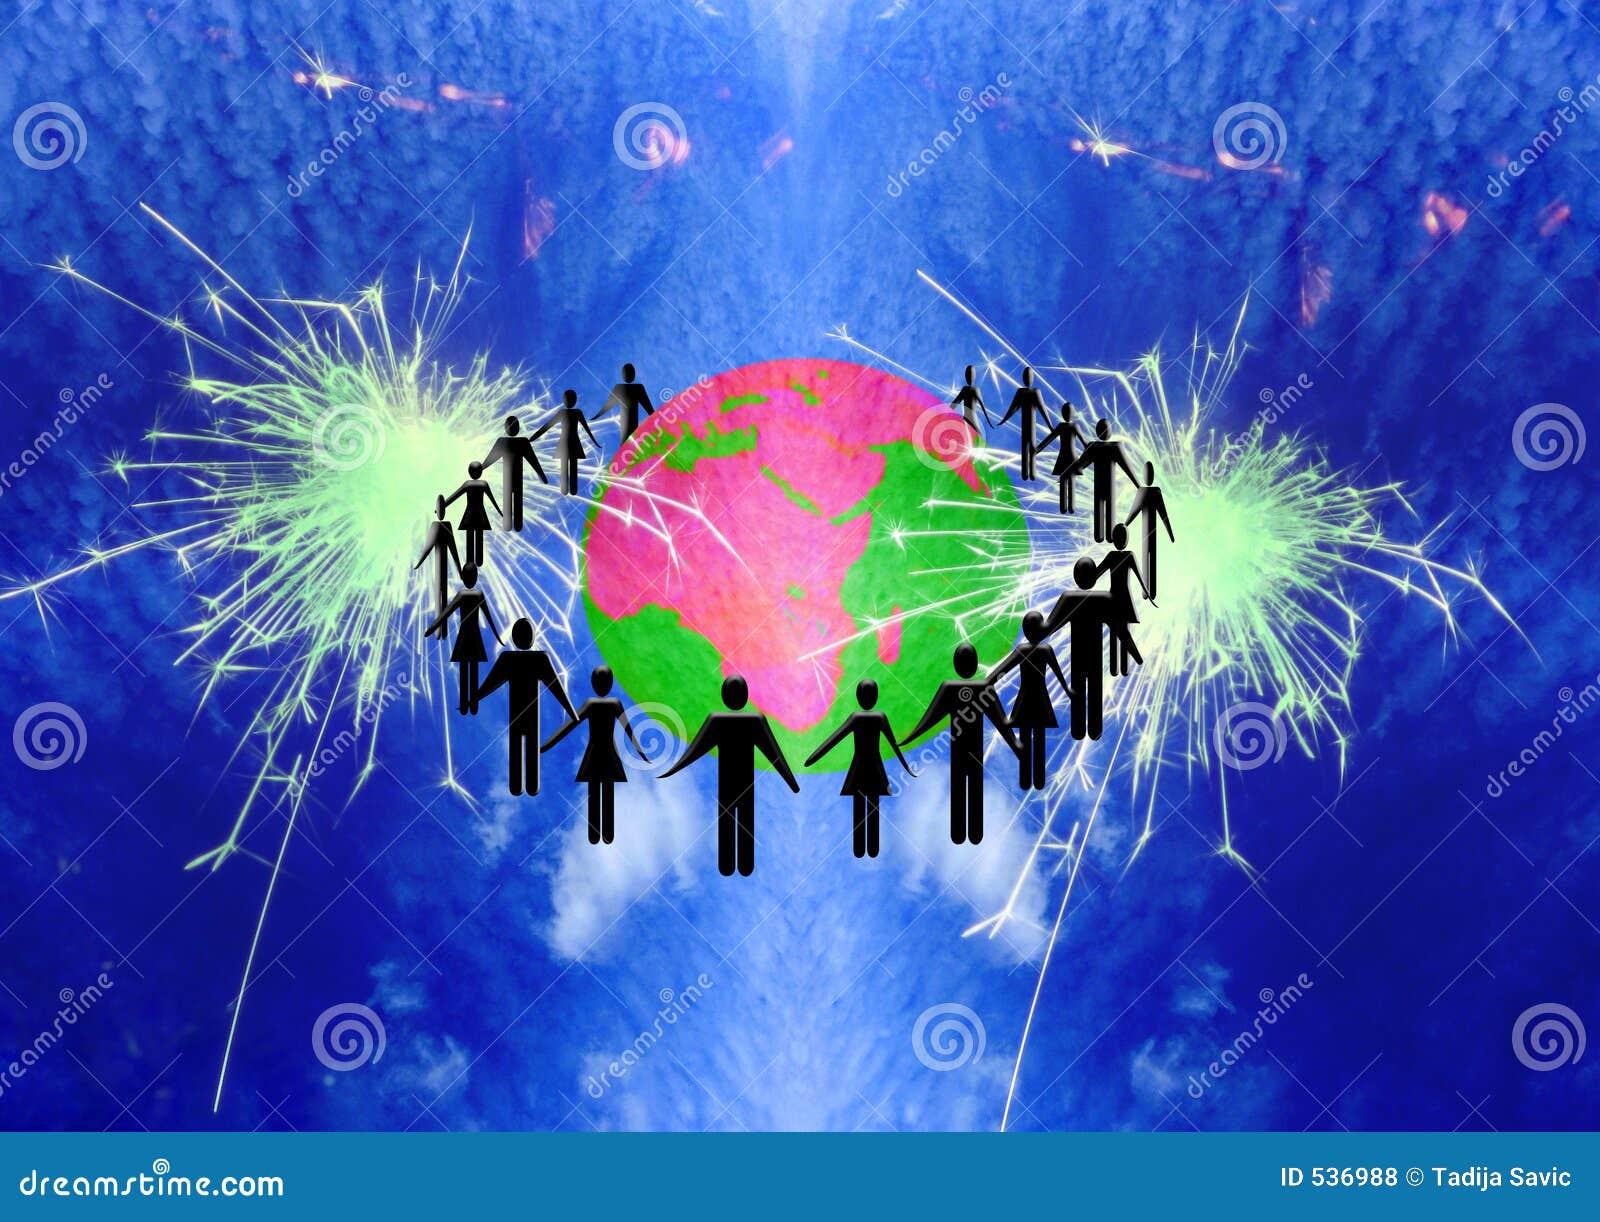 Download 人们团结的workteam 库存例证. 插画 包括有 商业, 例证, 图画, 世界, 配合, 纸张, 宇宙, 空间 - 536988